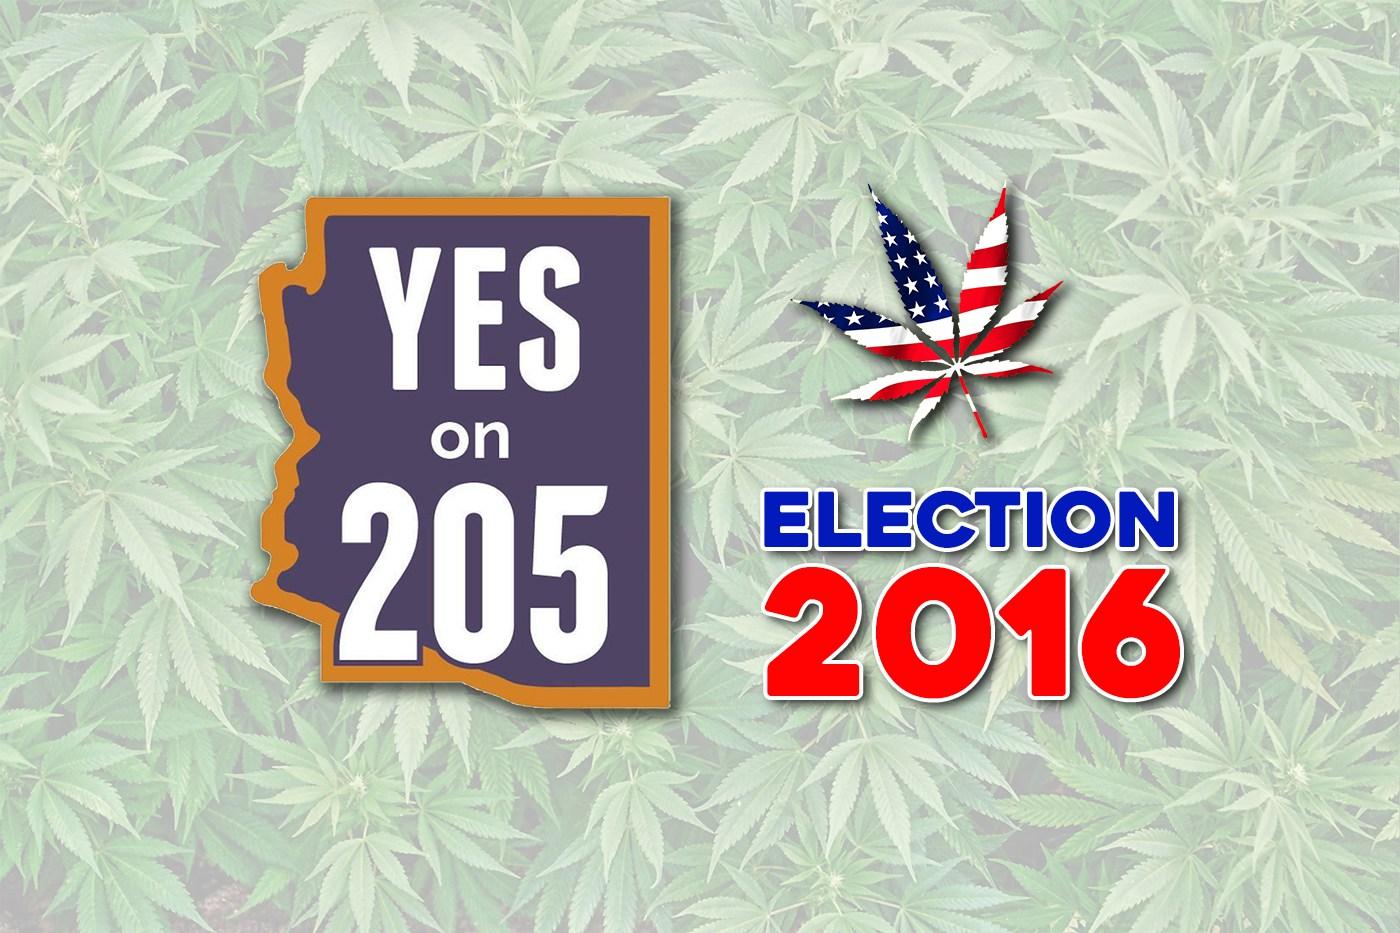 Yes on 205 in Arizona